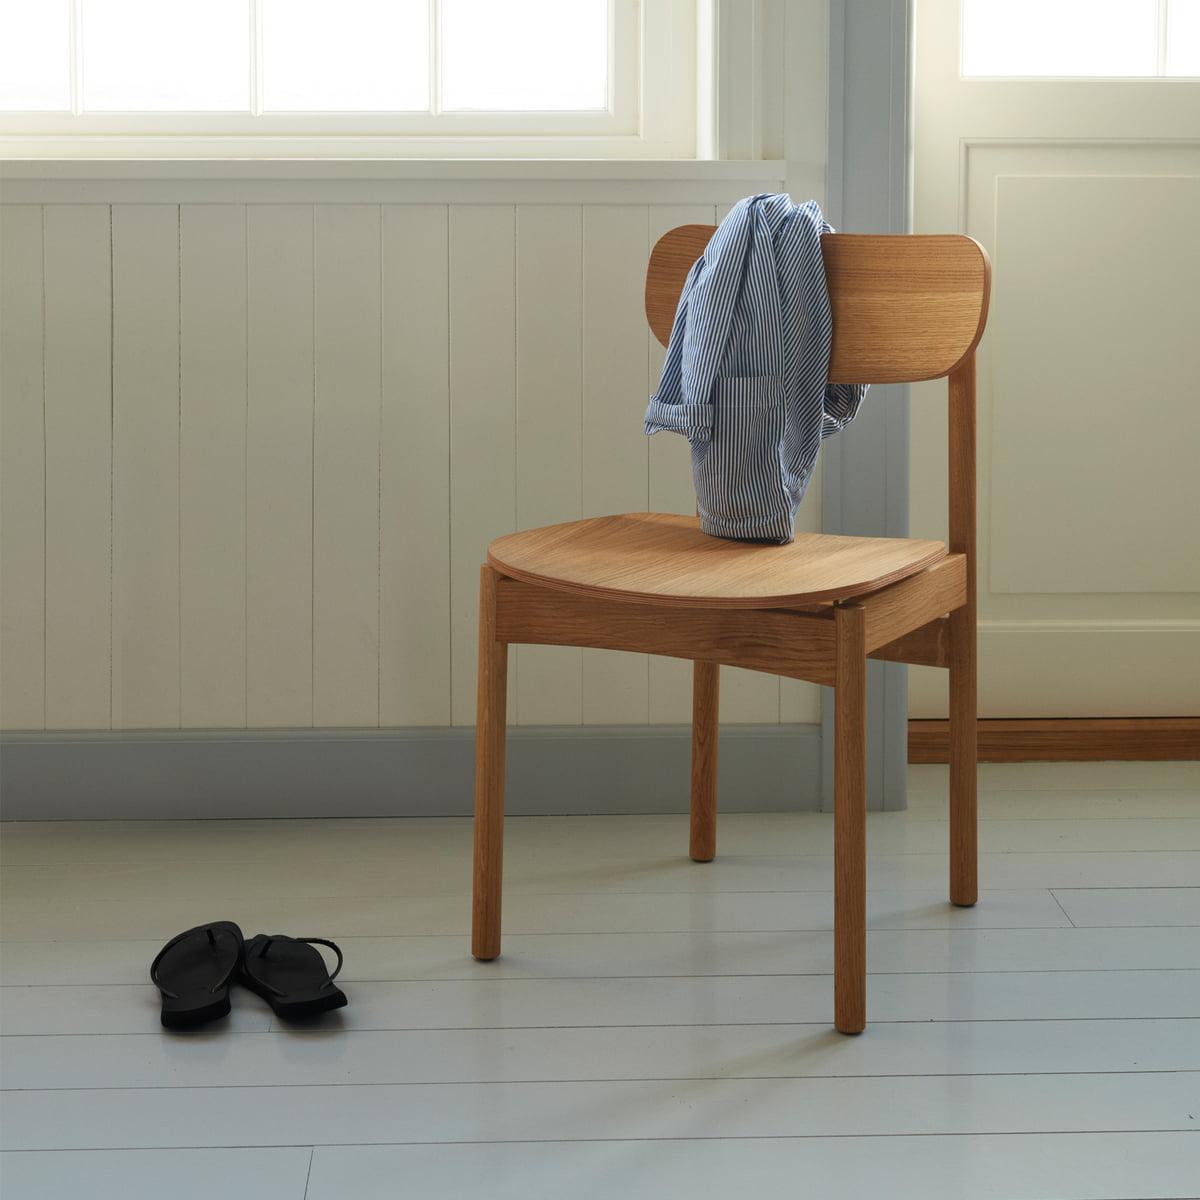 Https Www Connox Com Categories Furniture Seating Furniture Chairs Normann Copenhagen Hyg Chair Steel Html Https Www Connox Com M 100035 262407 Media Normann Copenhagen Hyg Normann Copenhagen Hyg Chair Ambiente 1 Jpg Hyg Chair From